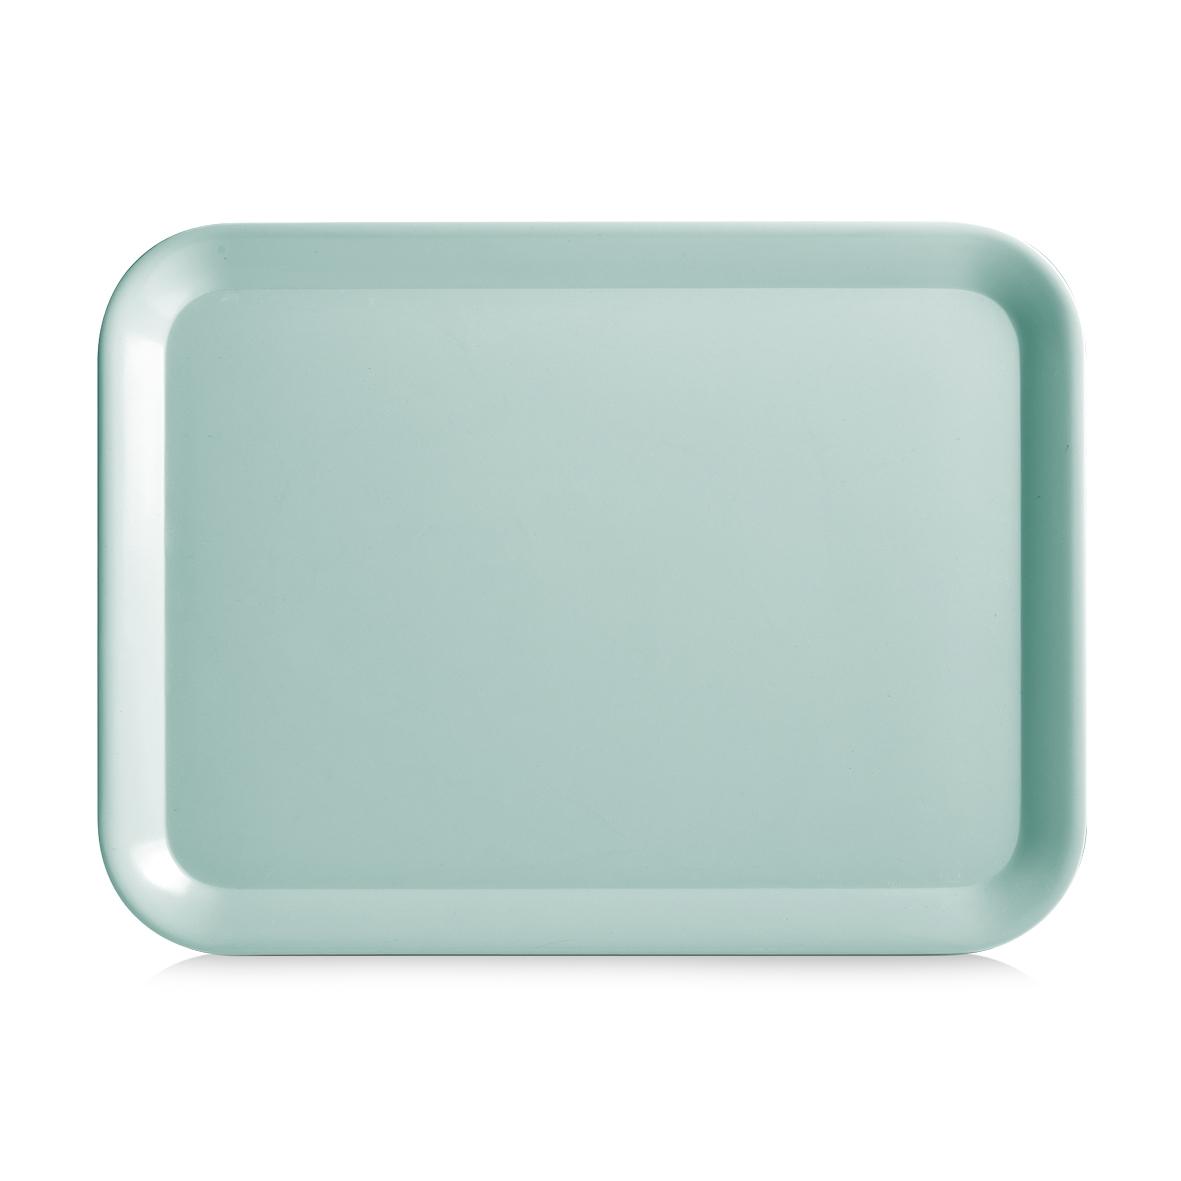 Tava pentru servire Aqua, Melamina, l43,5xA32,5 cm-Verde Mint imagine